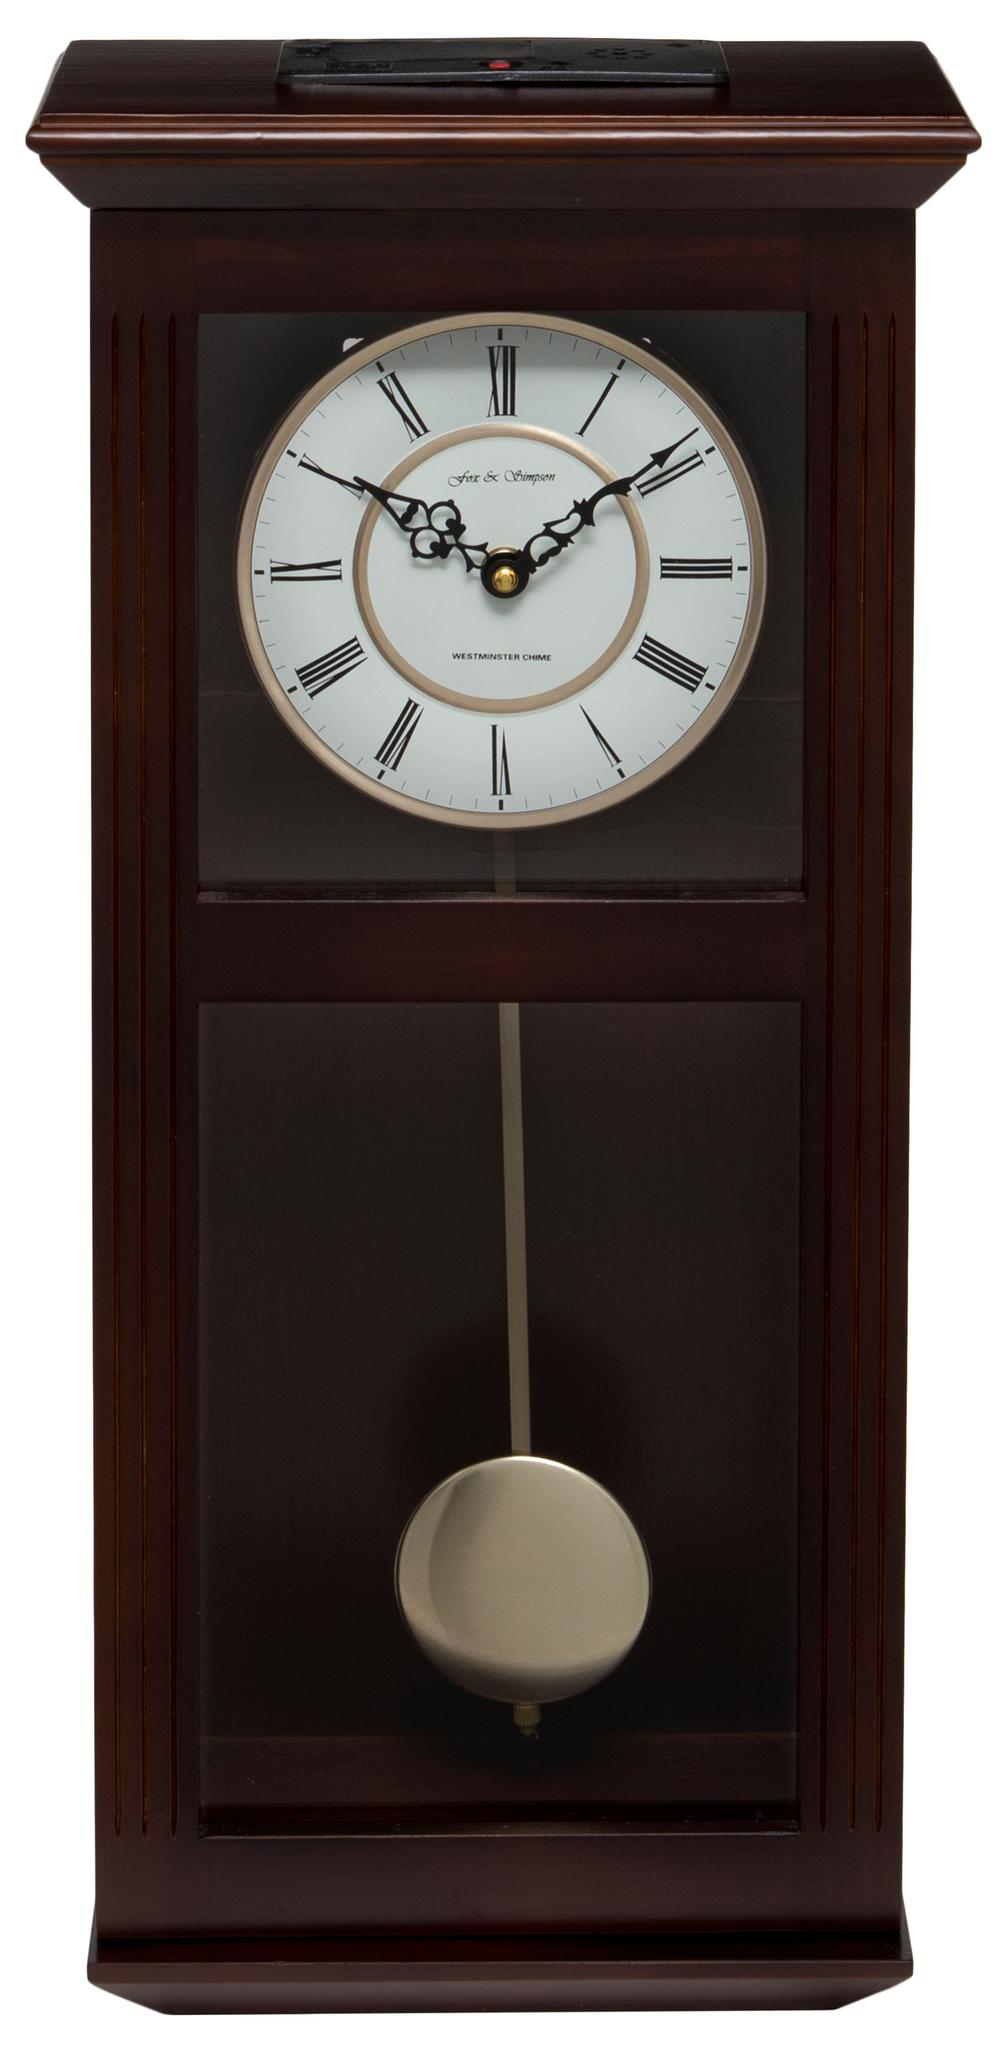 Ashton Walnut Pendulum Clock with Westminster Chimes